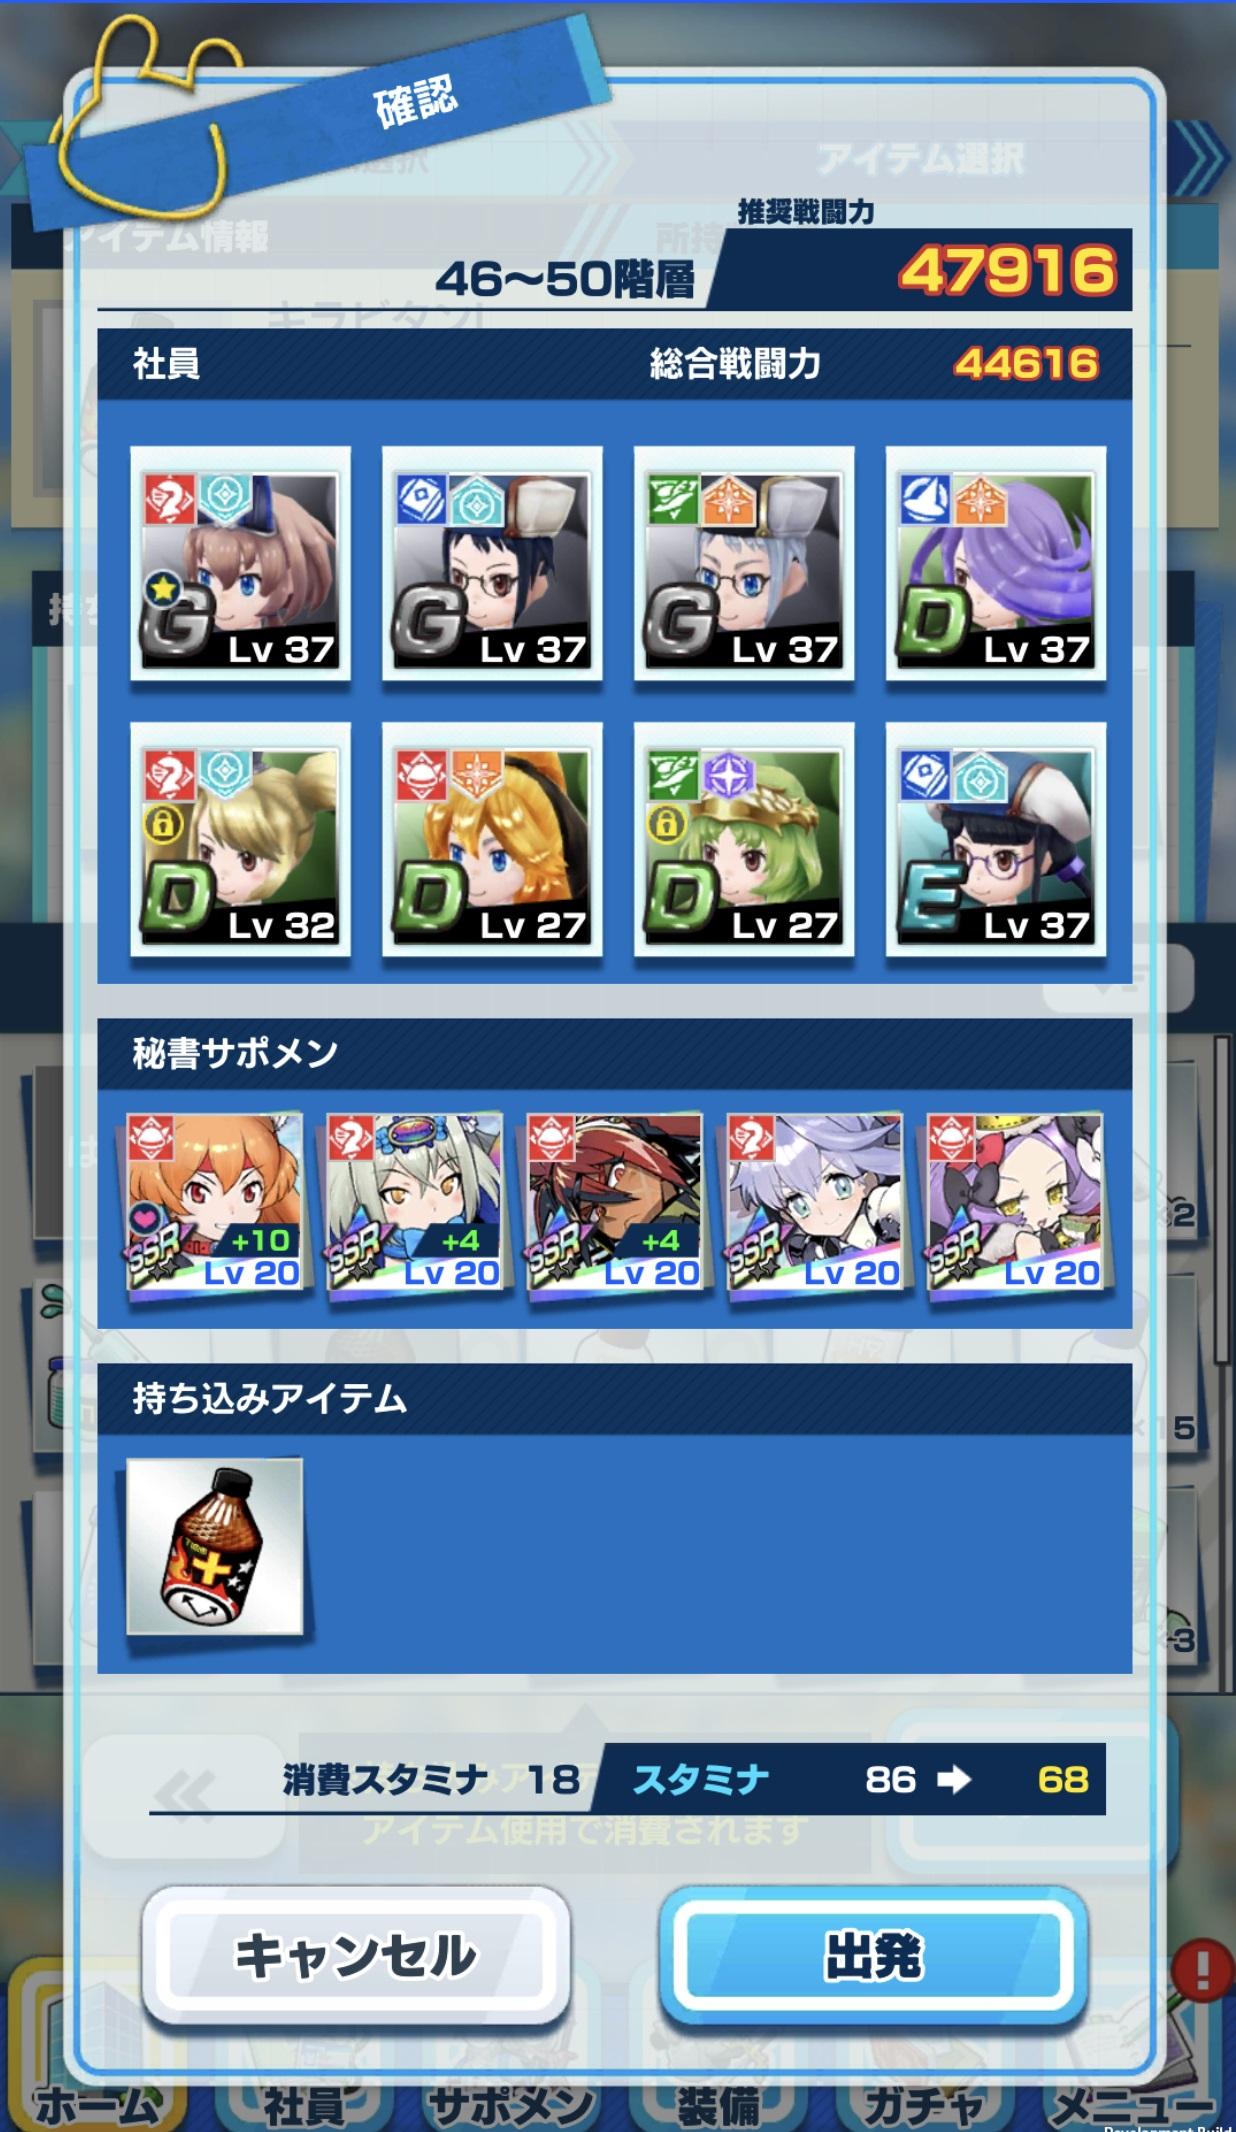 /theme/dengekionline/shachibato/images/system/Battle_07